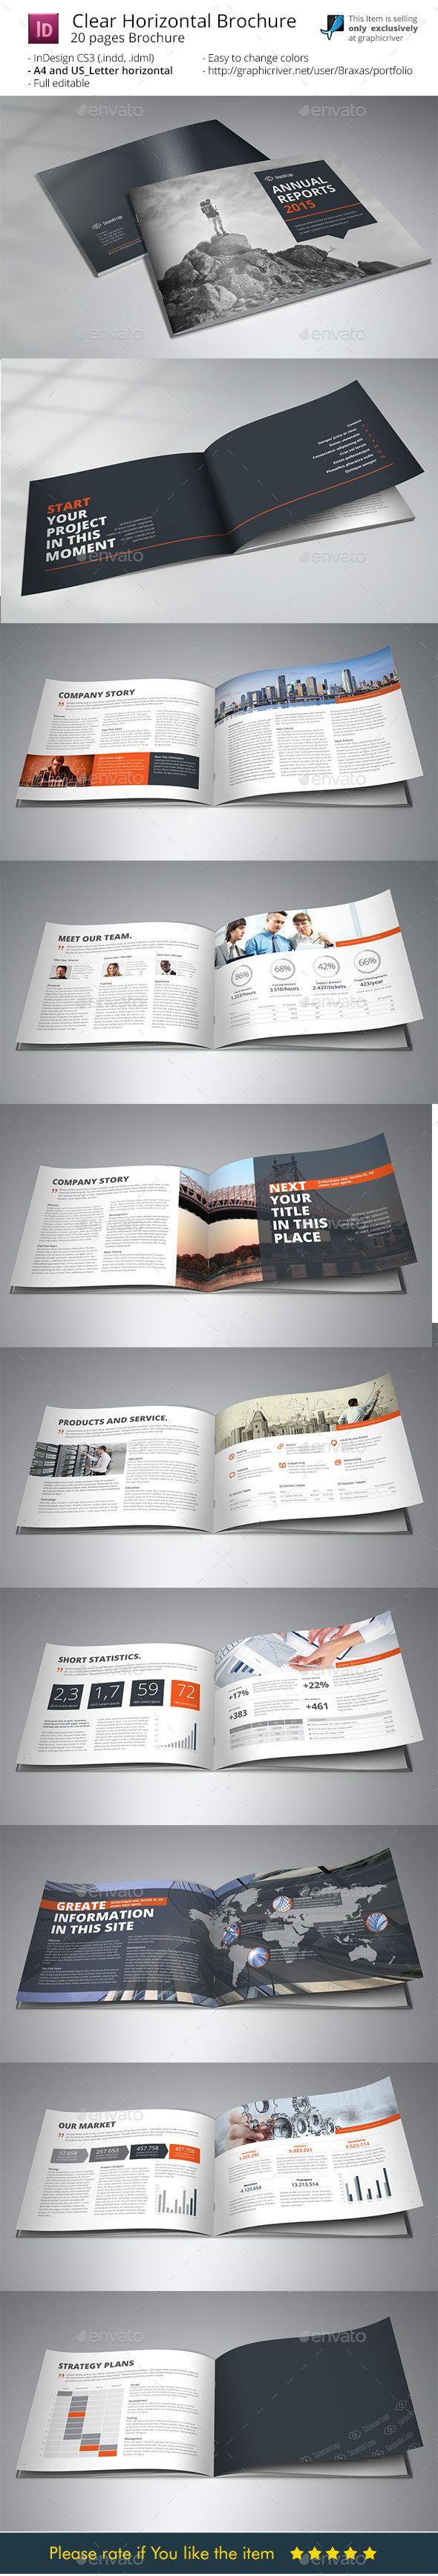 Clean Horizontal Brochure Indesigne Template Brochure Template - Horizontal brochure template